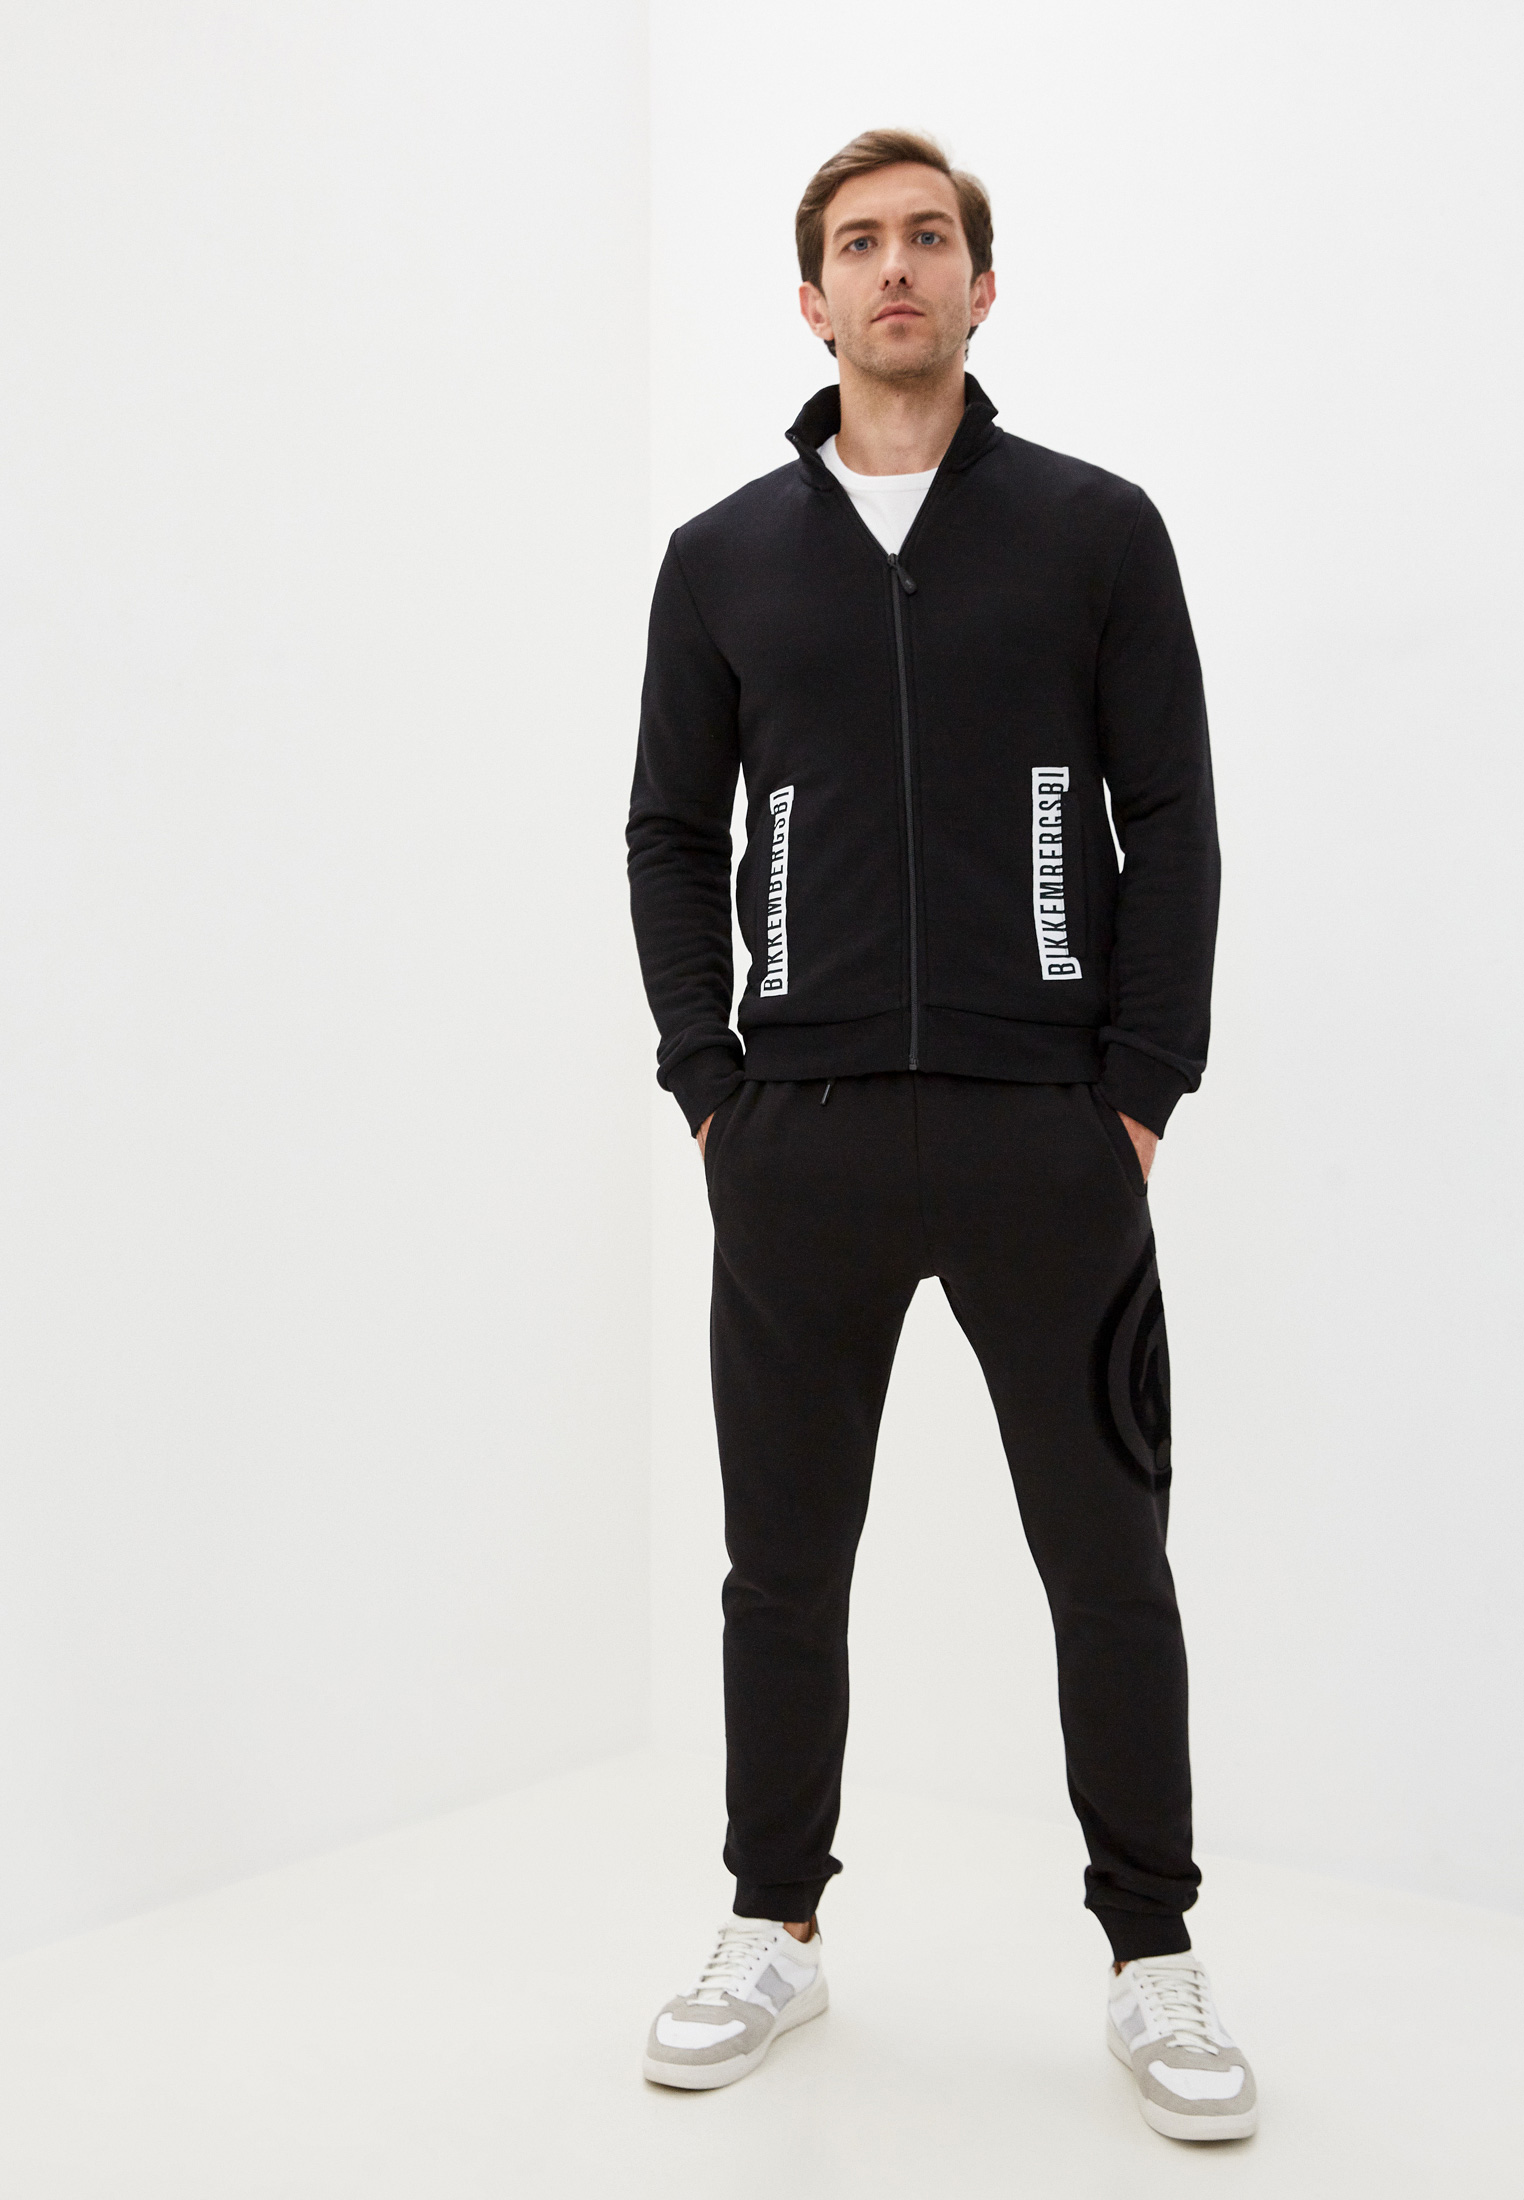 Мужские спортивные брюки Bikkembergs (Биккембергс) C 1 159 1T M 4121: изображение 3